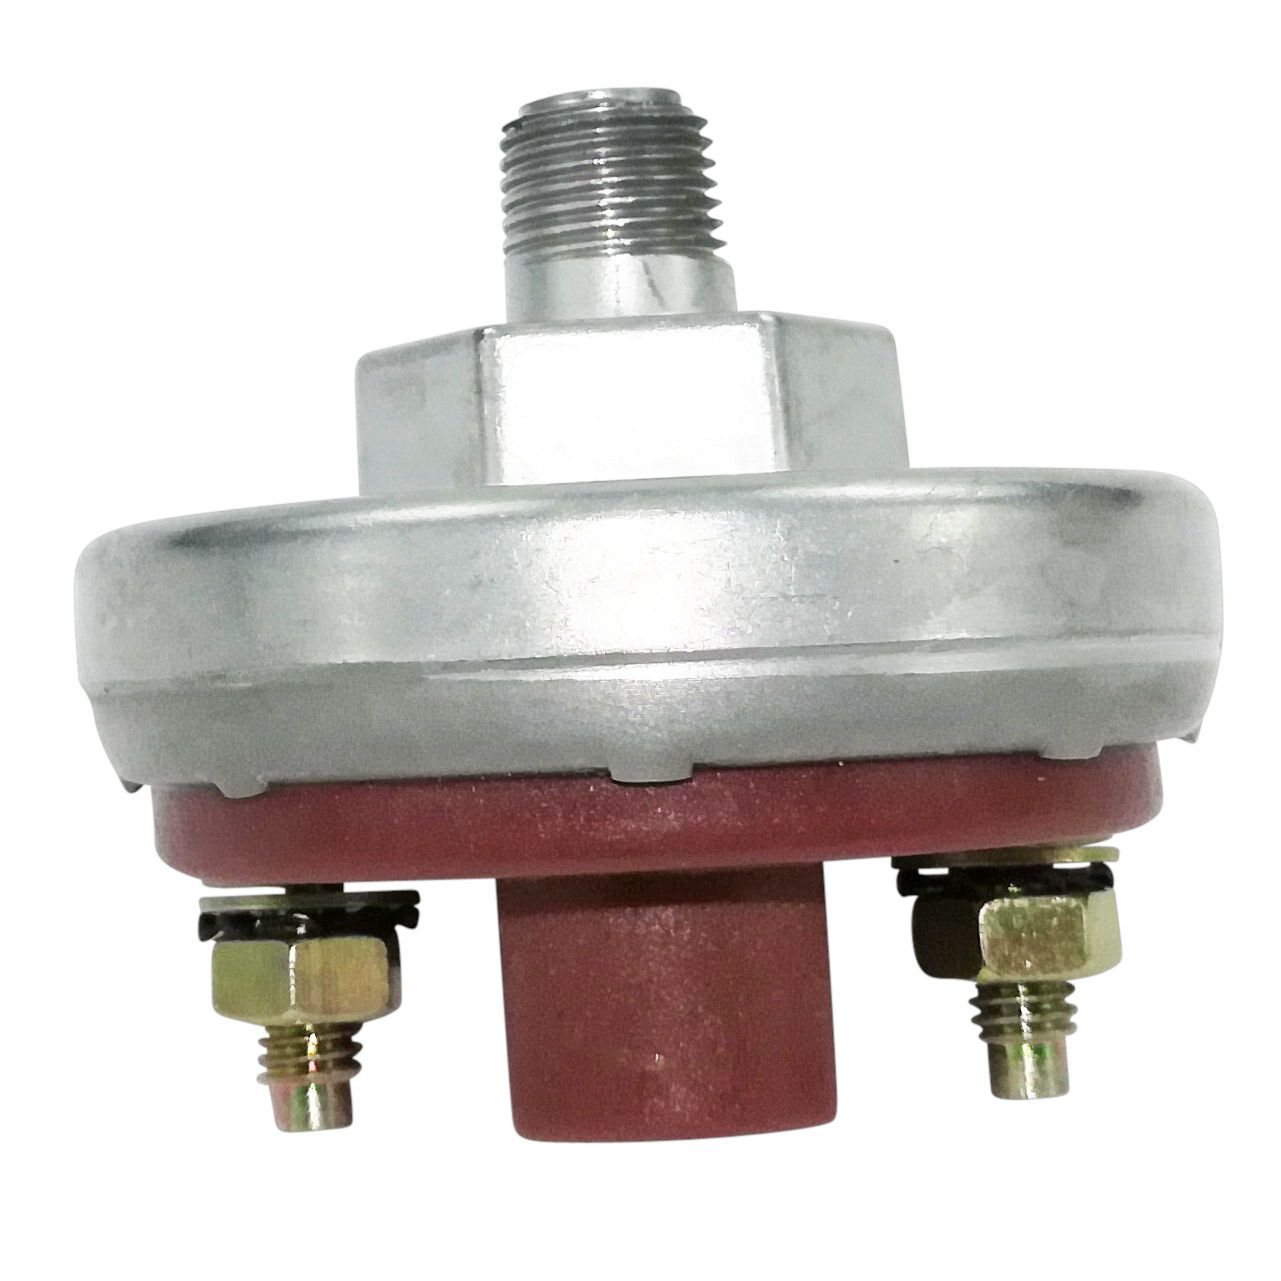 Low Air Pressure Indicator Brake Light Switch Single